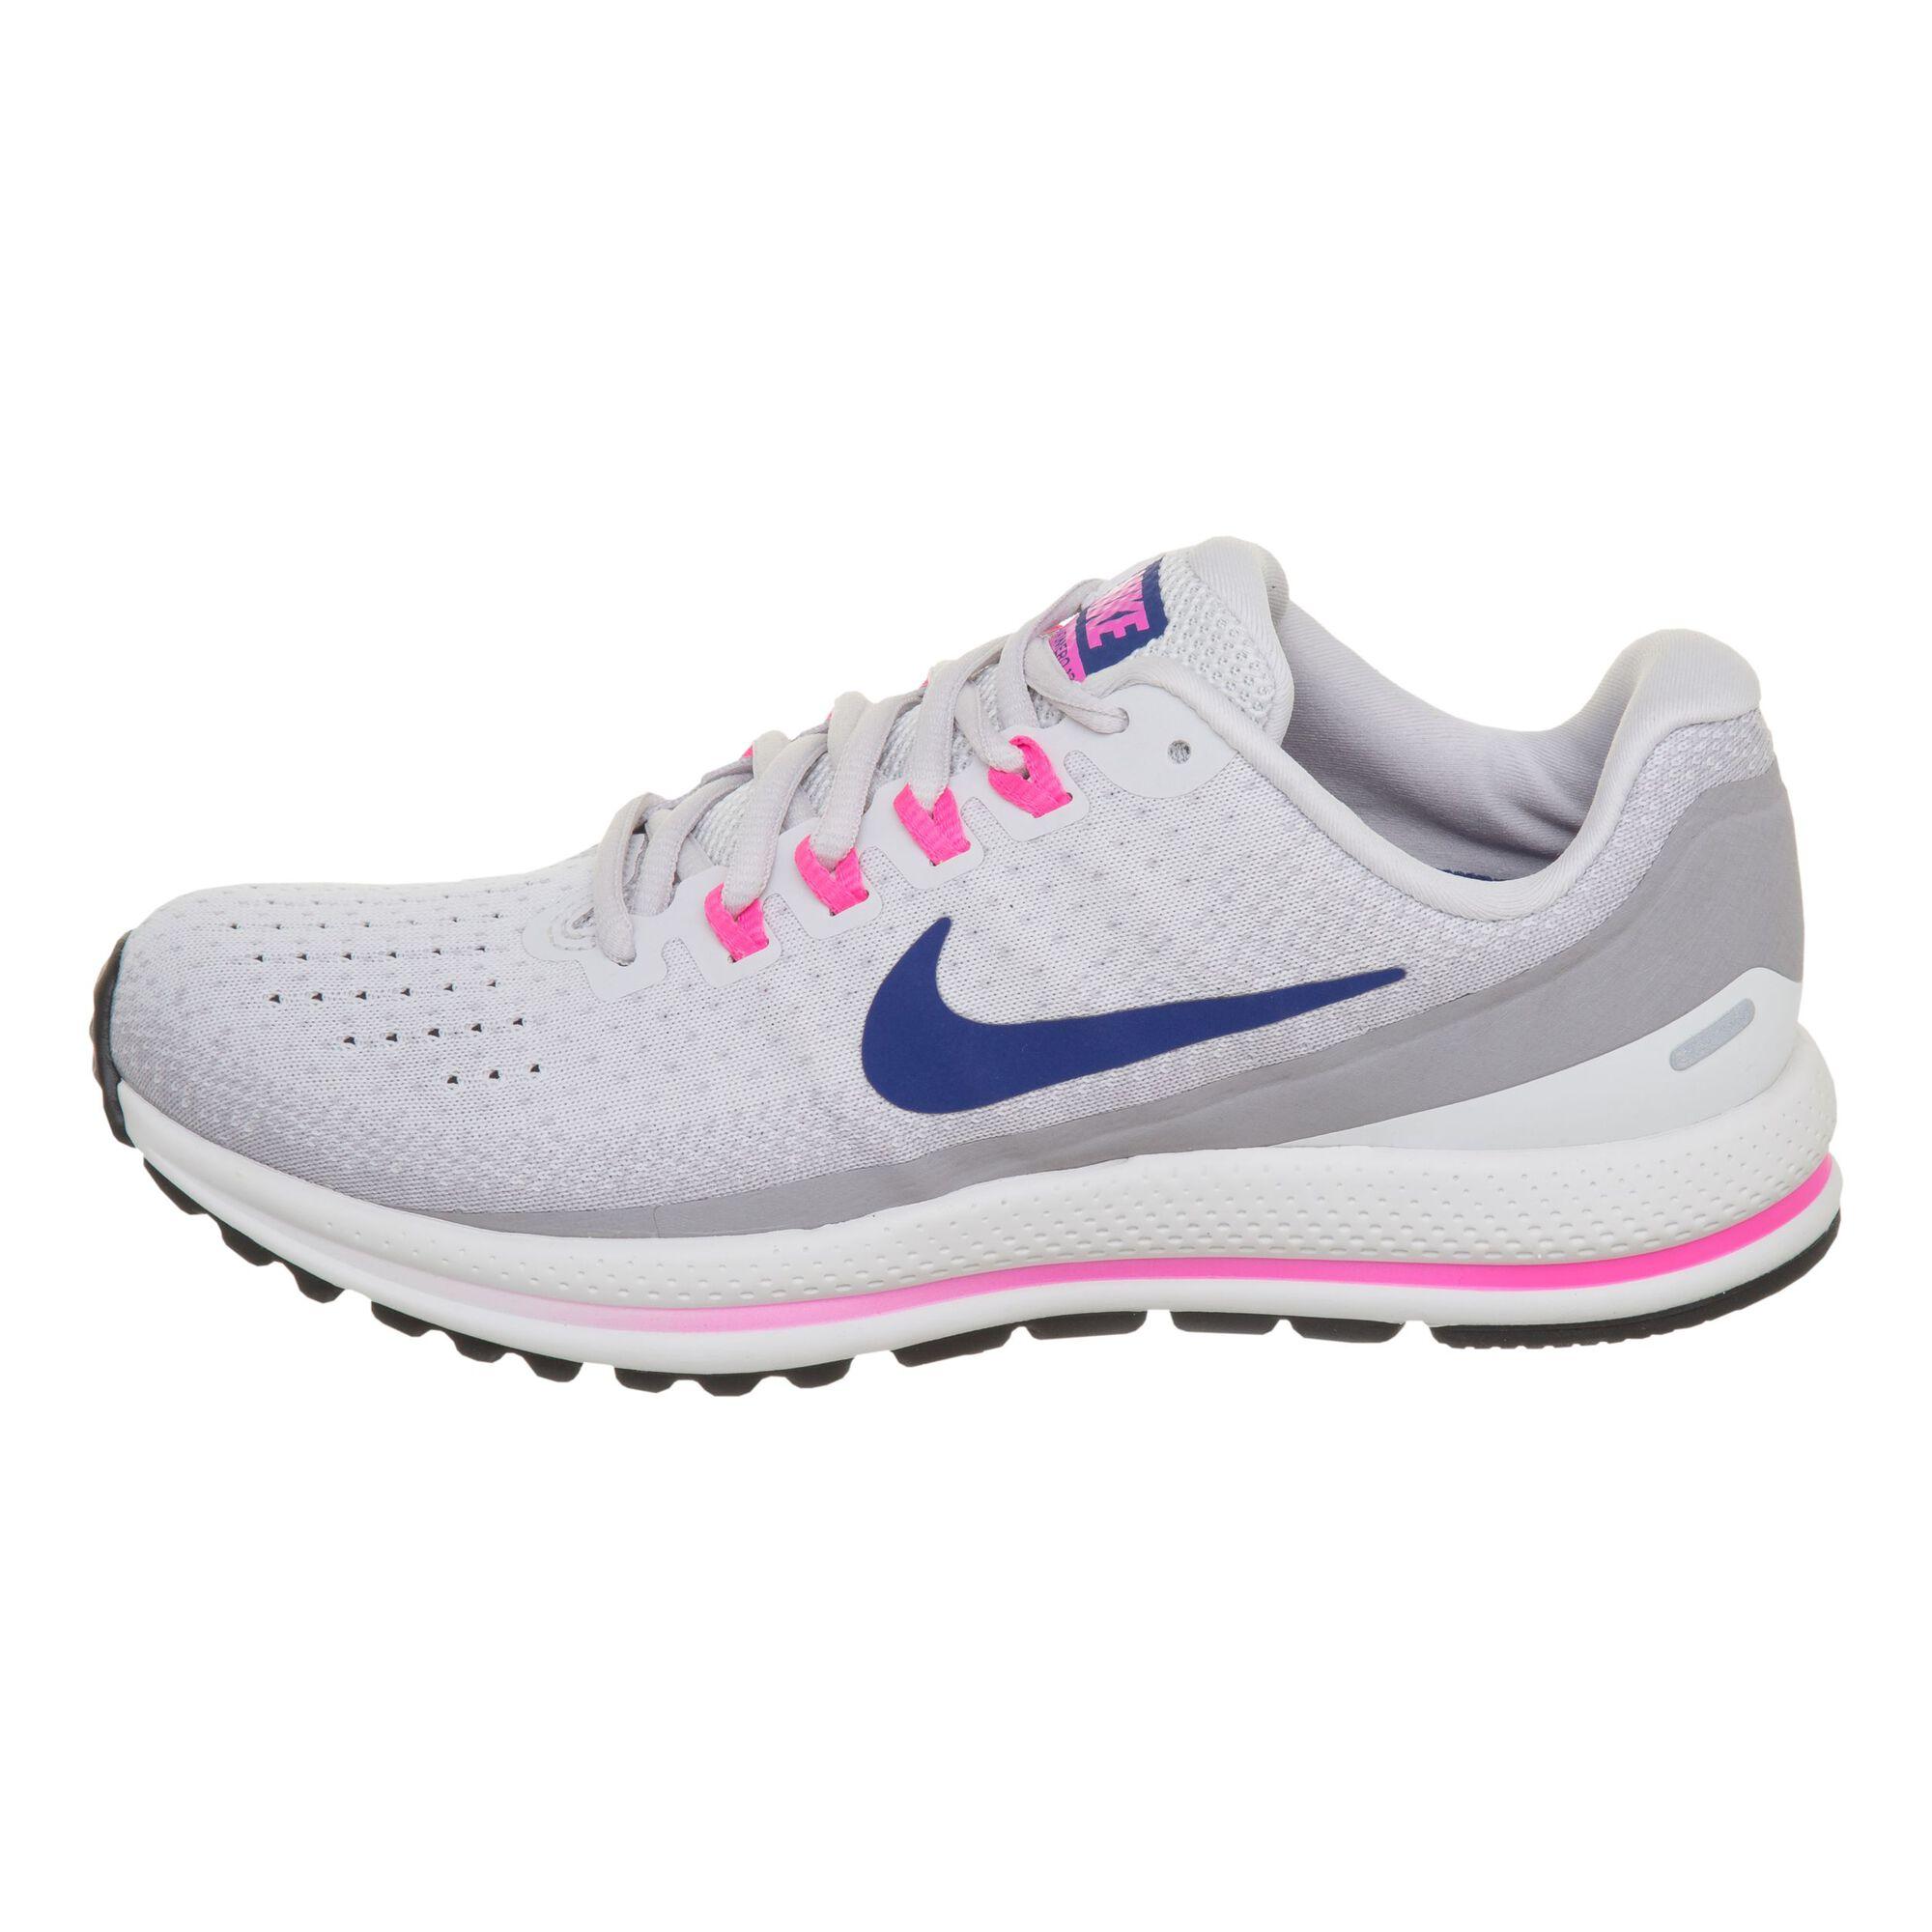 ad02f2165bd Nike · Nike · Nike · Nike · Nike · Nike · Nike · Nike · Nike · Nike. Air  Zoom Vomero 13 Women ...